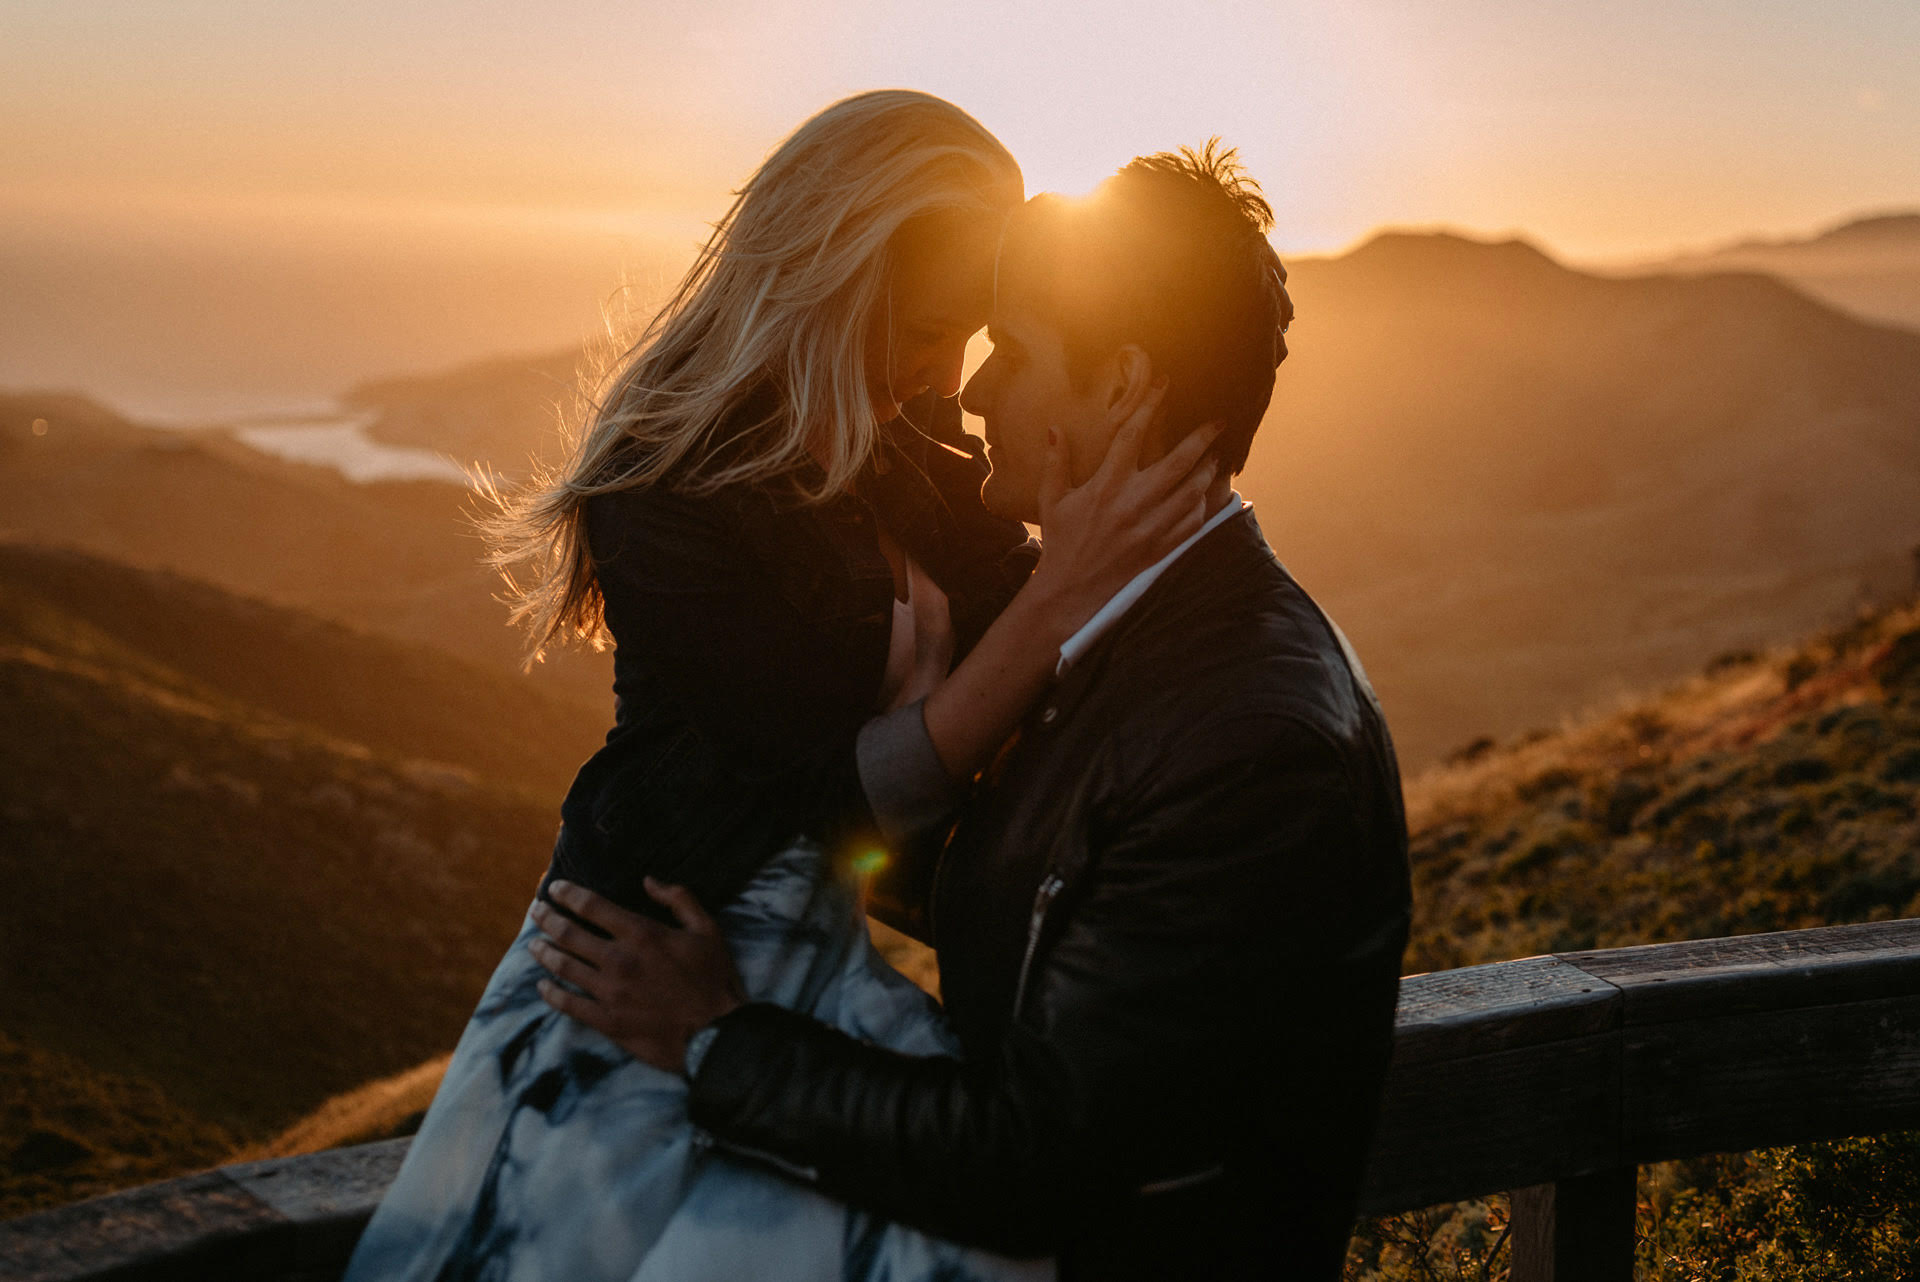 destination wedding photography session